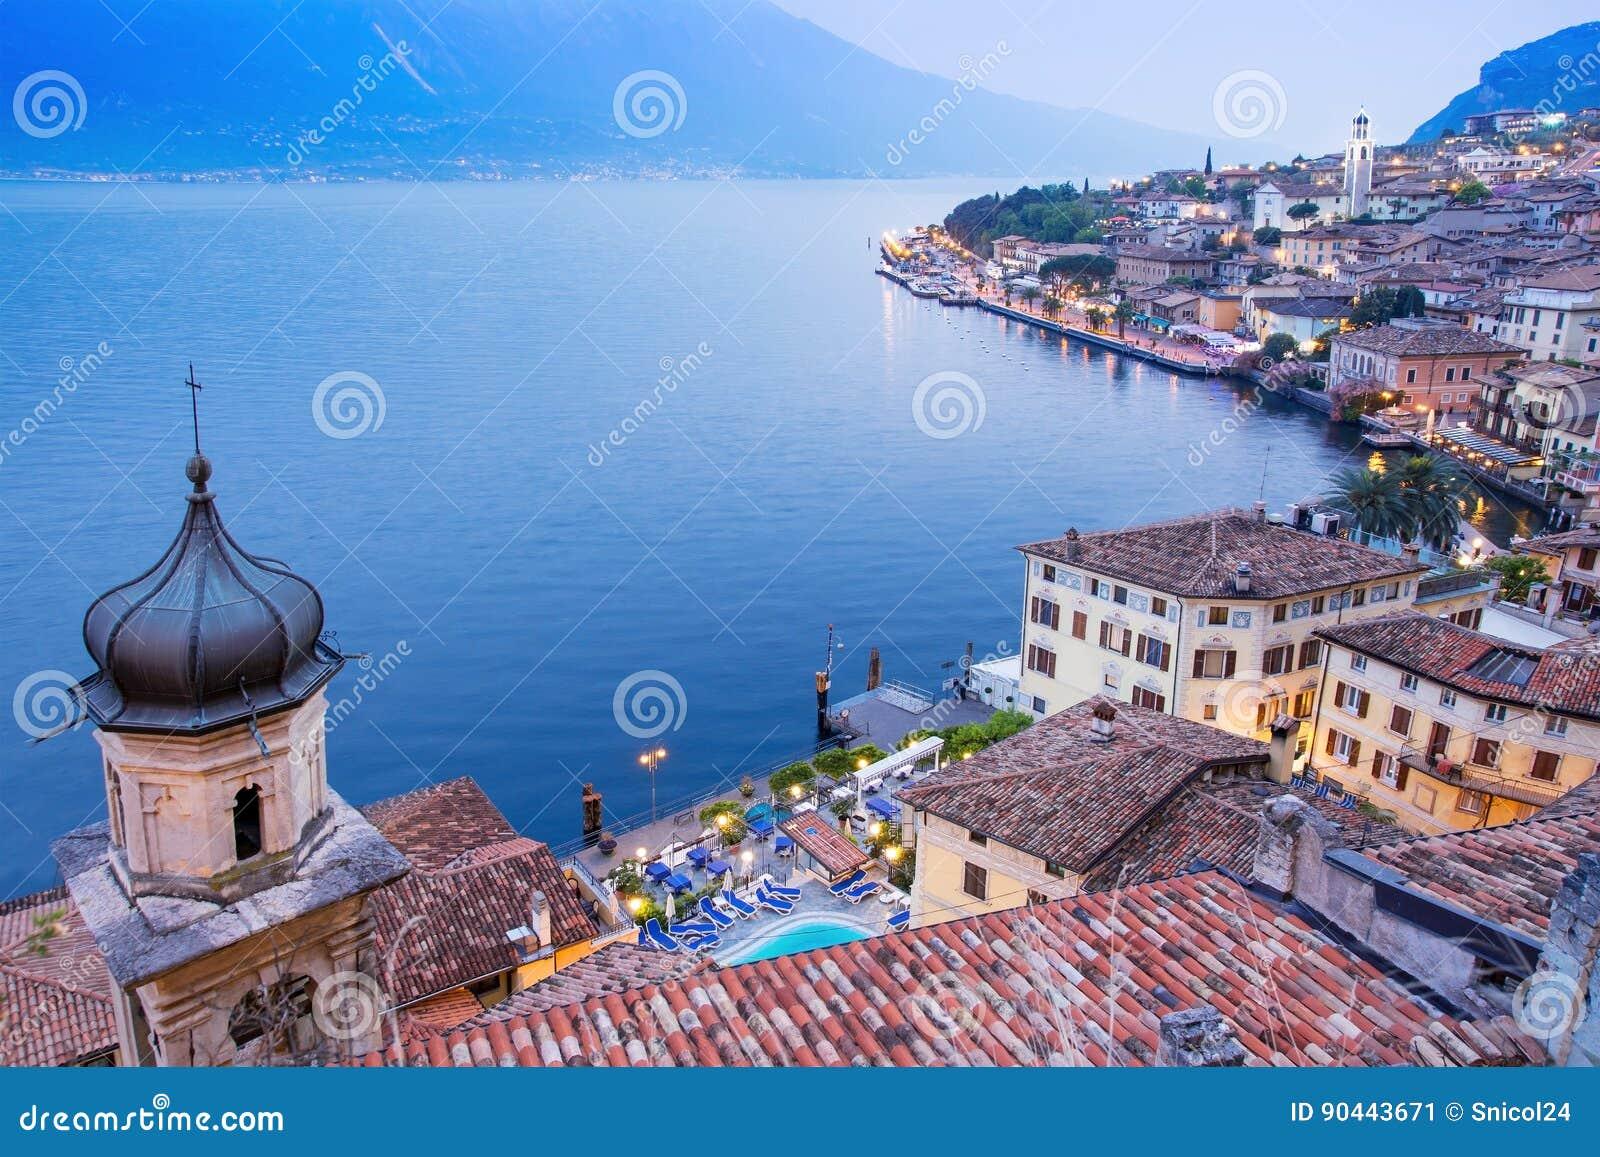 Limone sul加尔达,湖加尔达,意大利